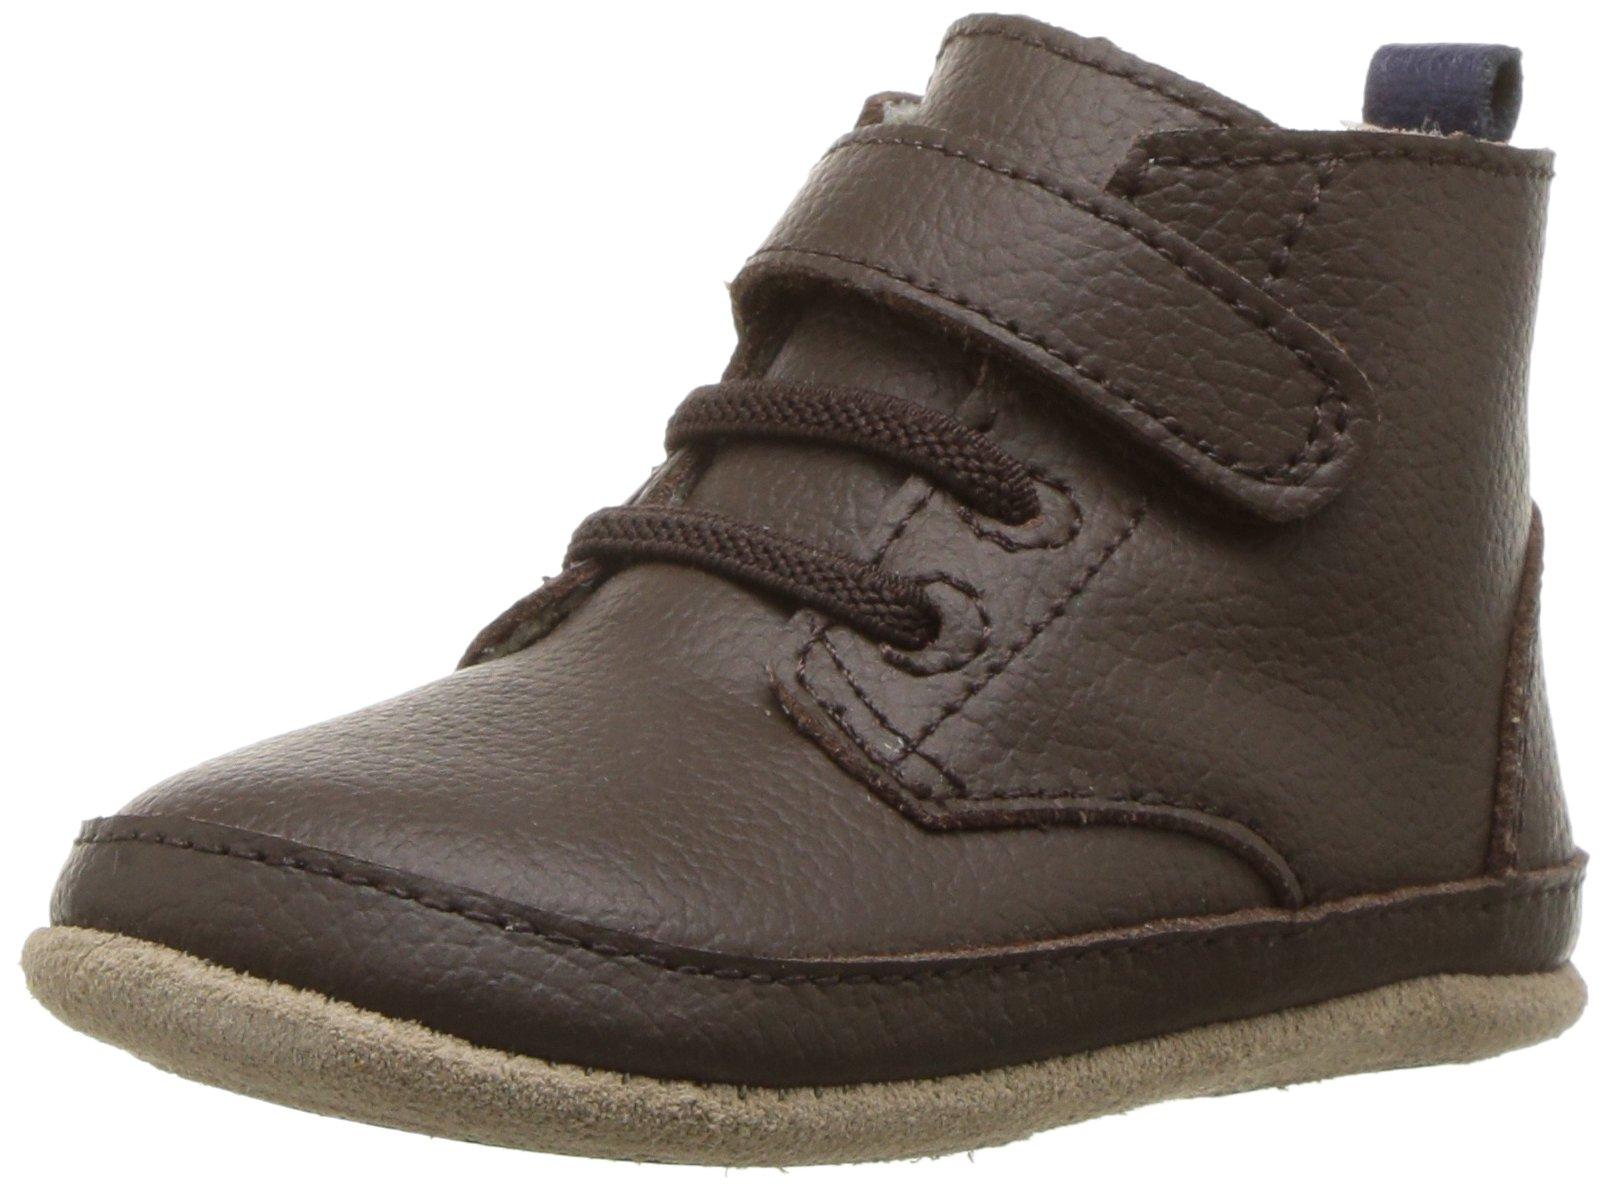 Robeez Boys Boot Crib Shoe, Nick Espresso, 12-18 Months M US Infant